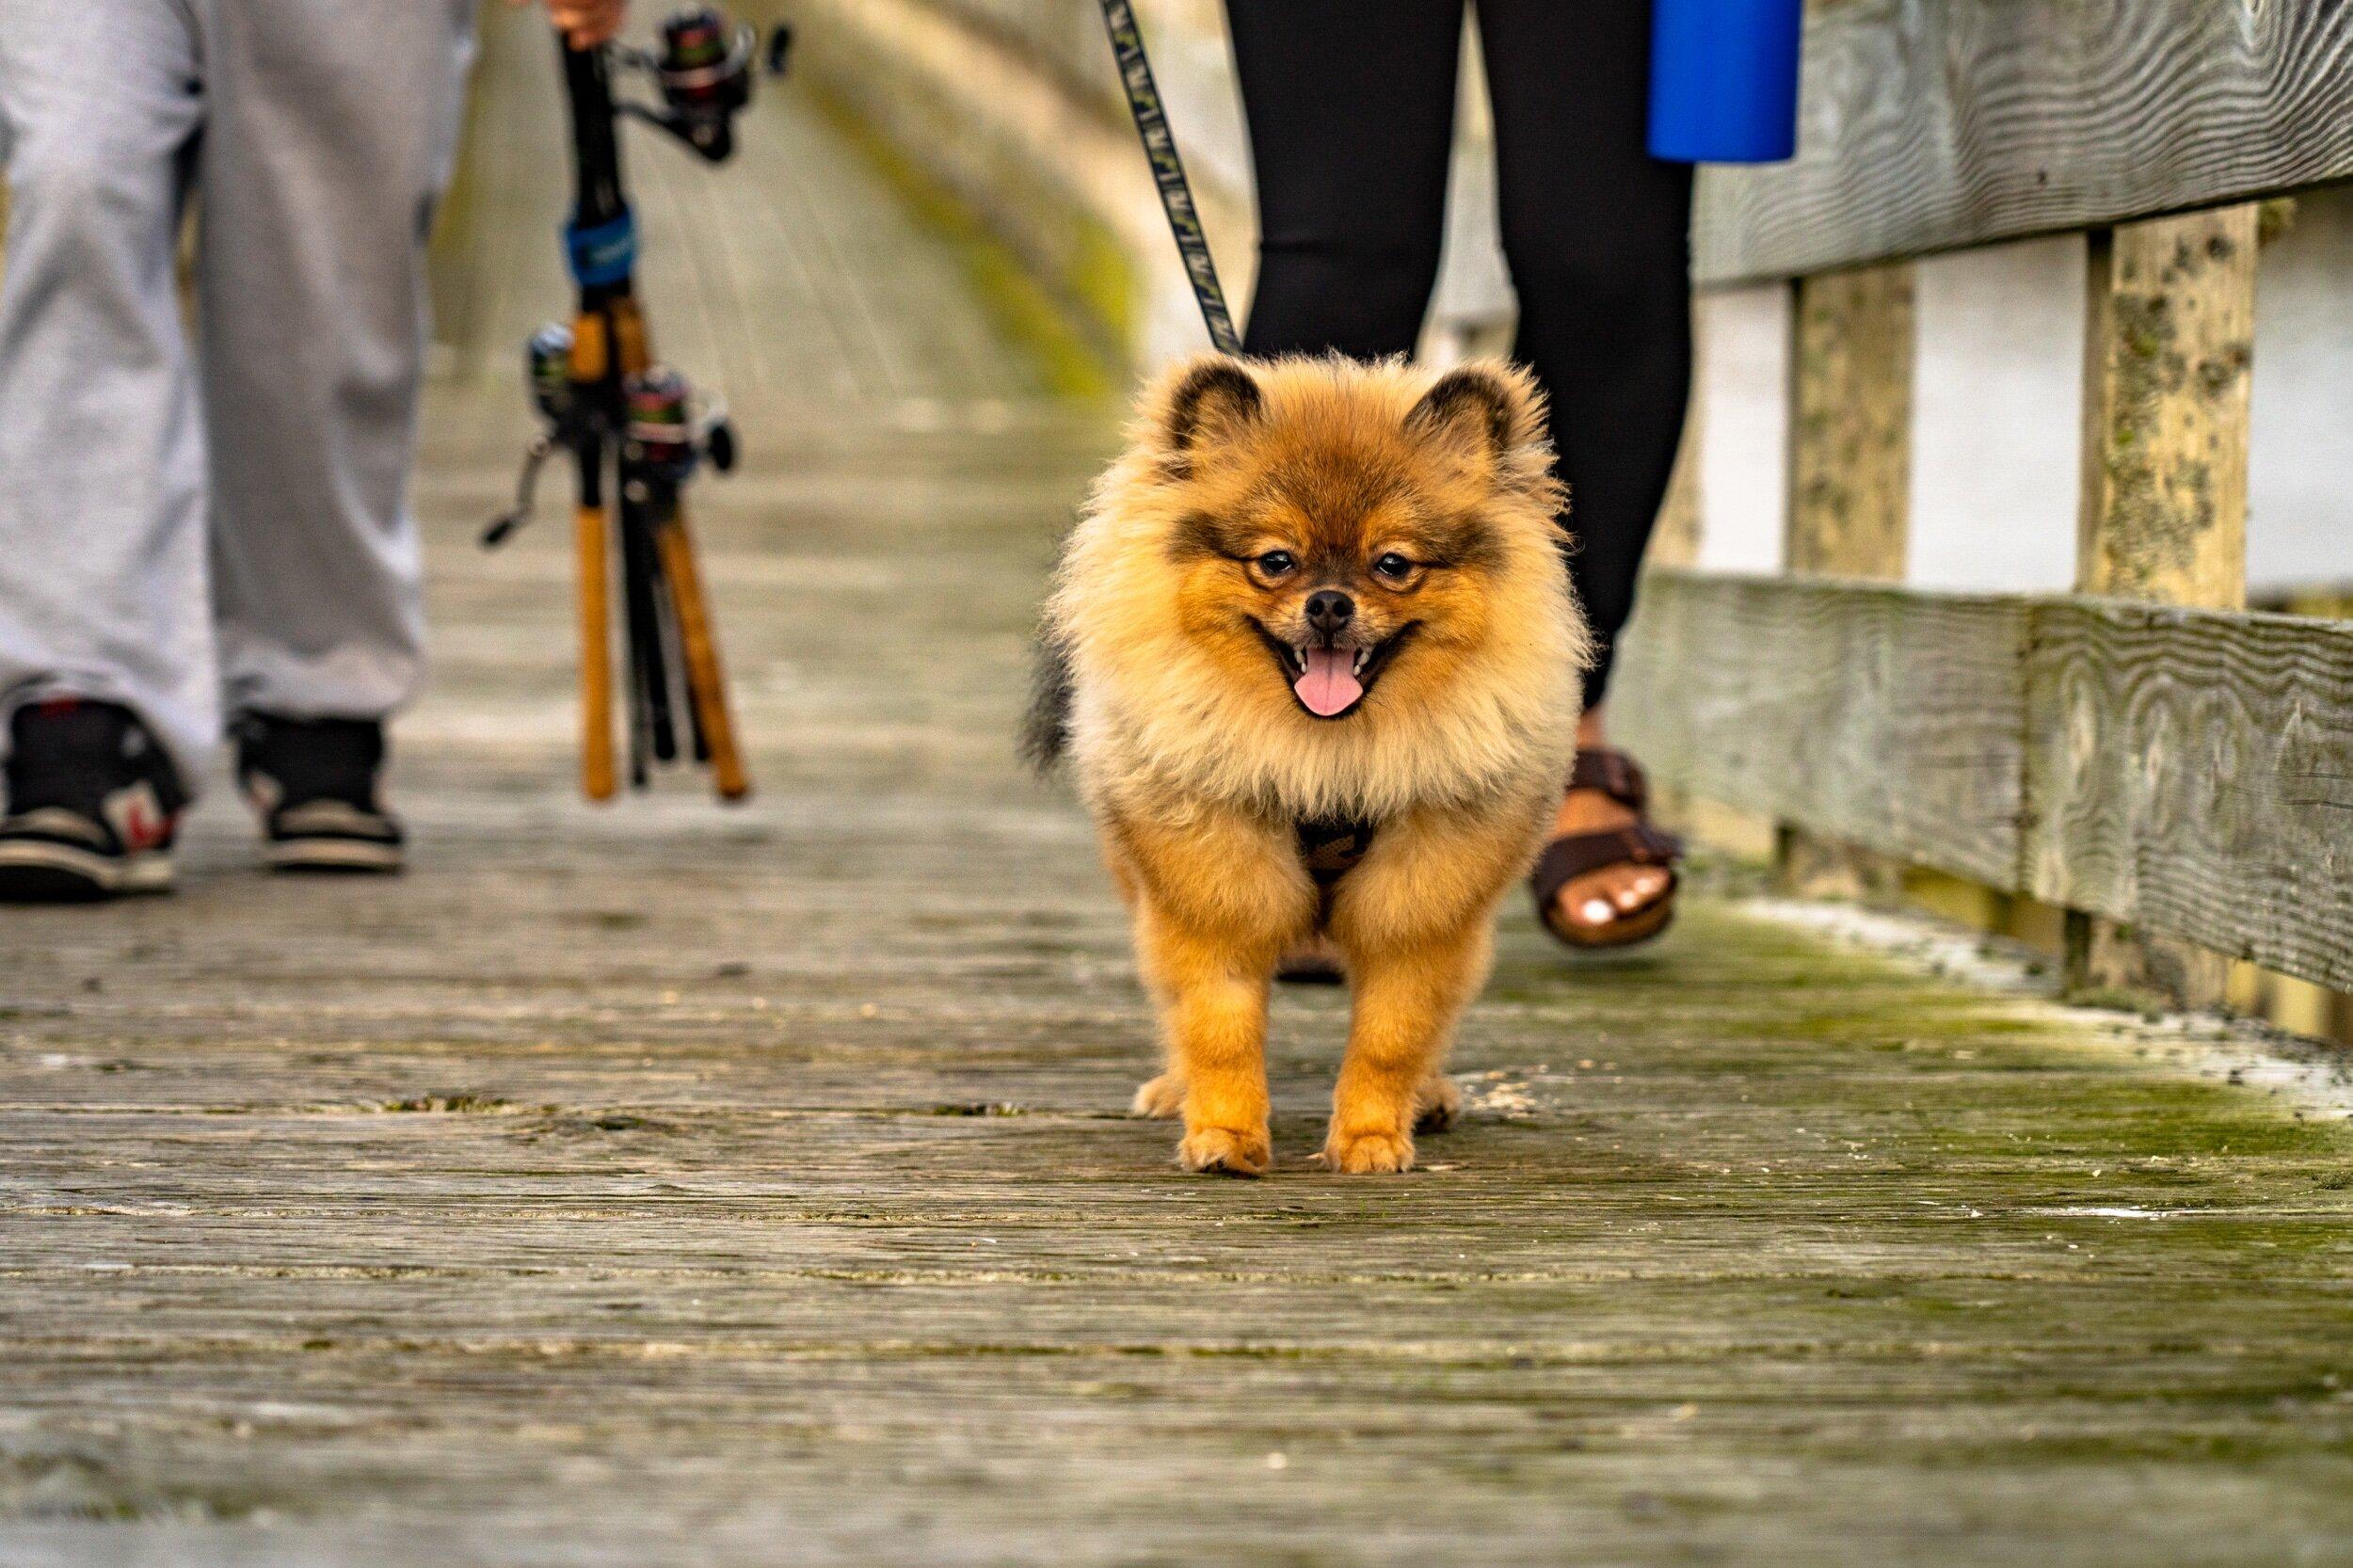 Dog Friendly - Westport unleashed! Bring the entire family, Westport is an extremely dog friendly town.Find the perfect beach in Westport!